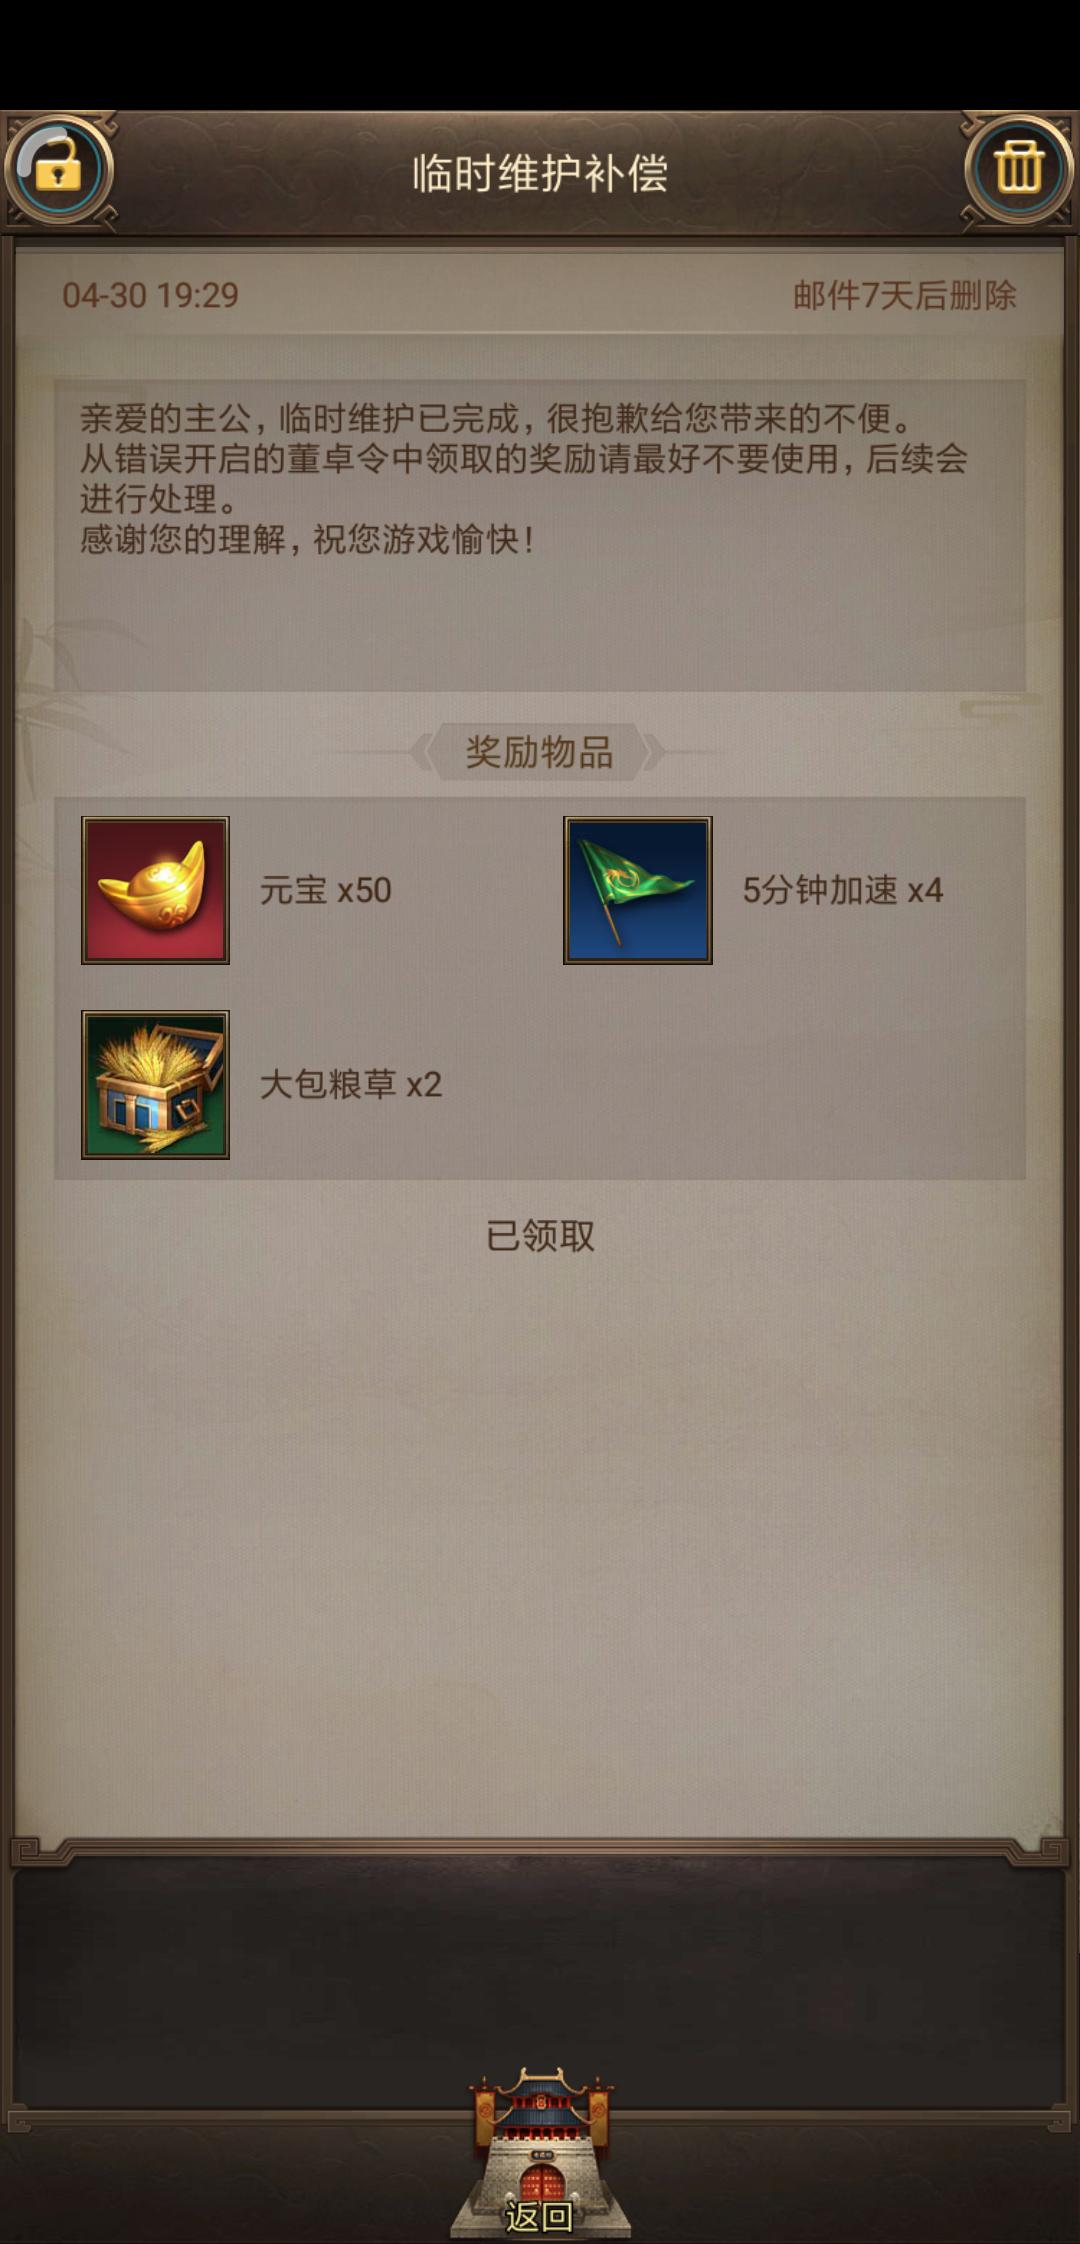 Screenshot_2019-04-30-20-55-32-804_com.jedigames.p16.mi.png